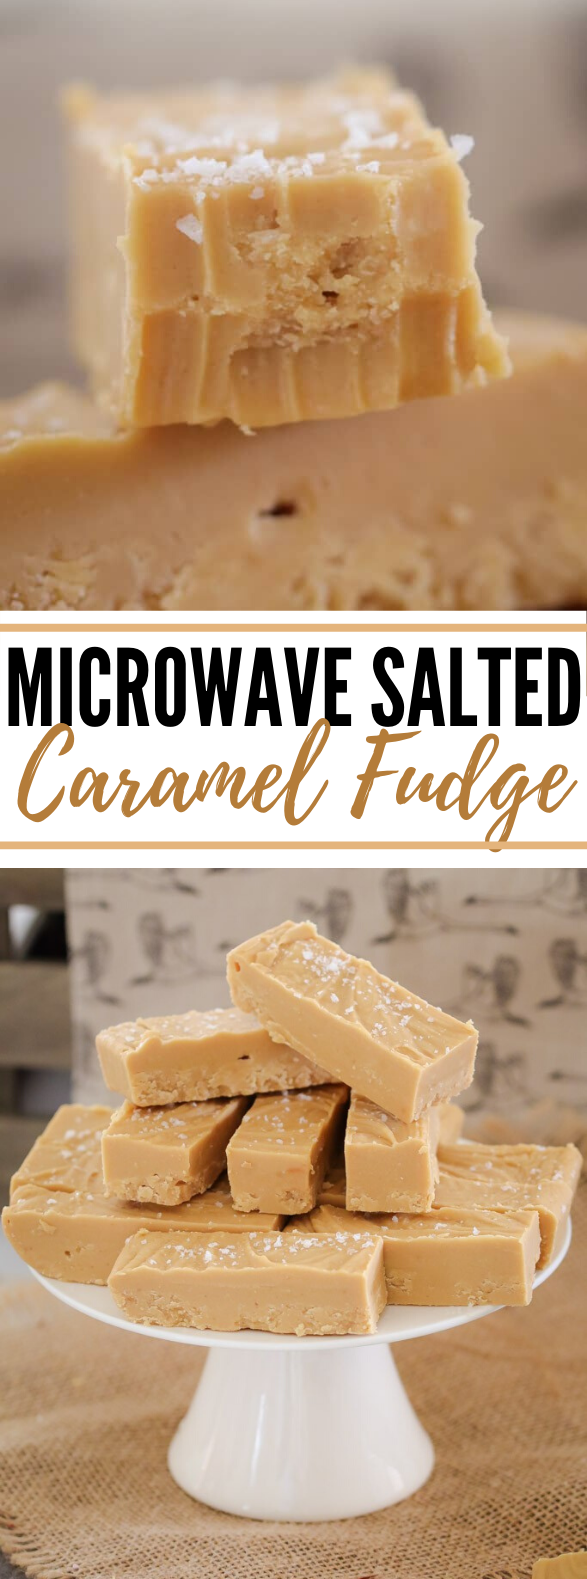 Microwave Salted Caramel Fudge #desserts #sweets